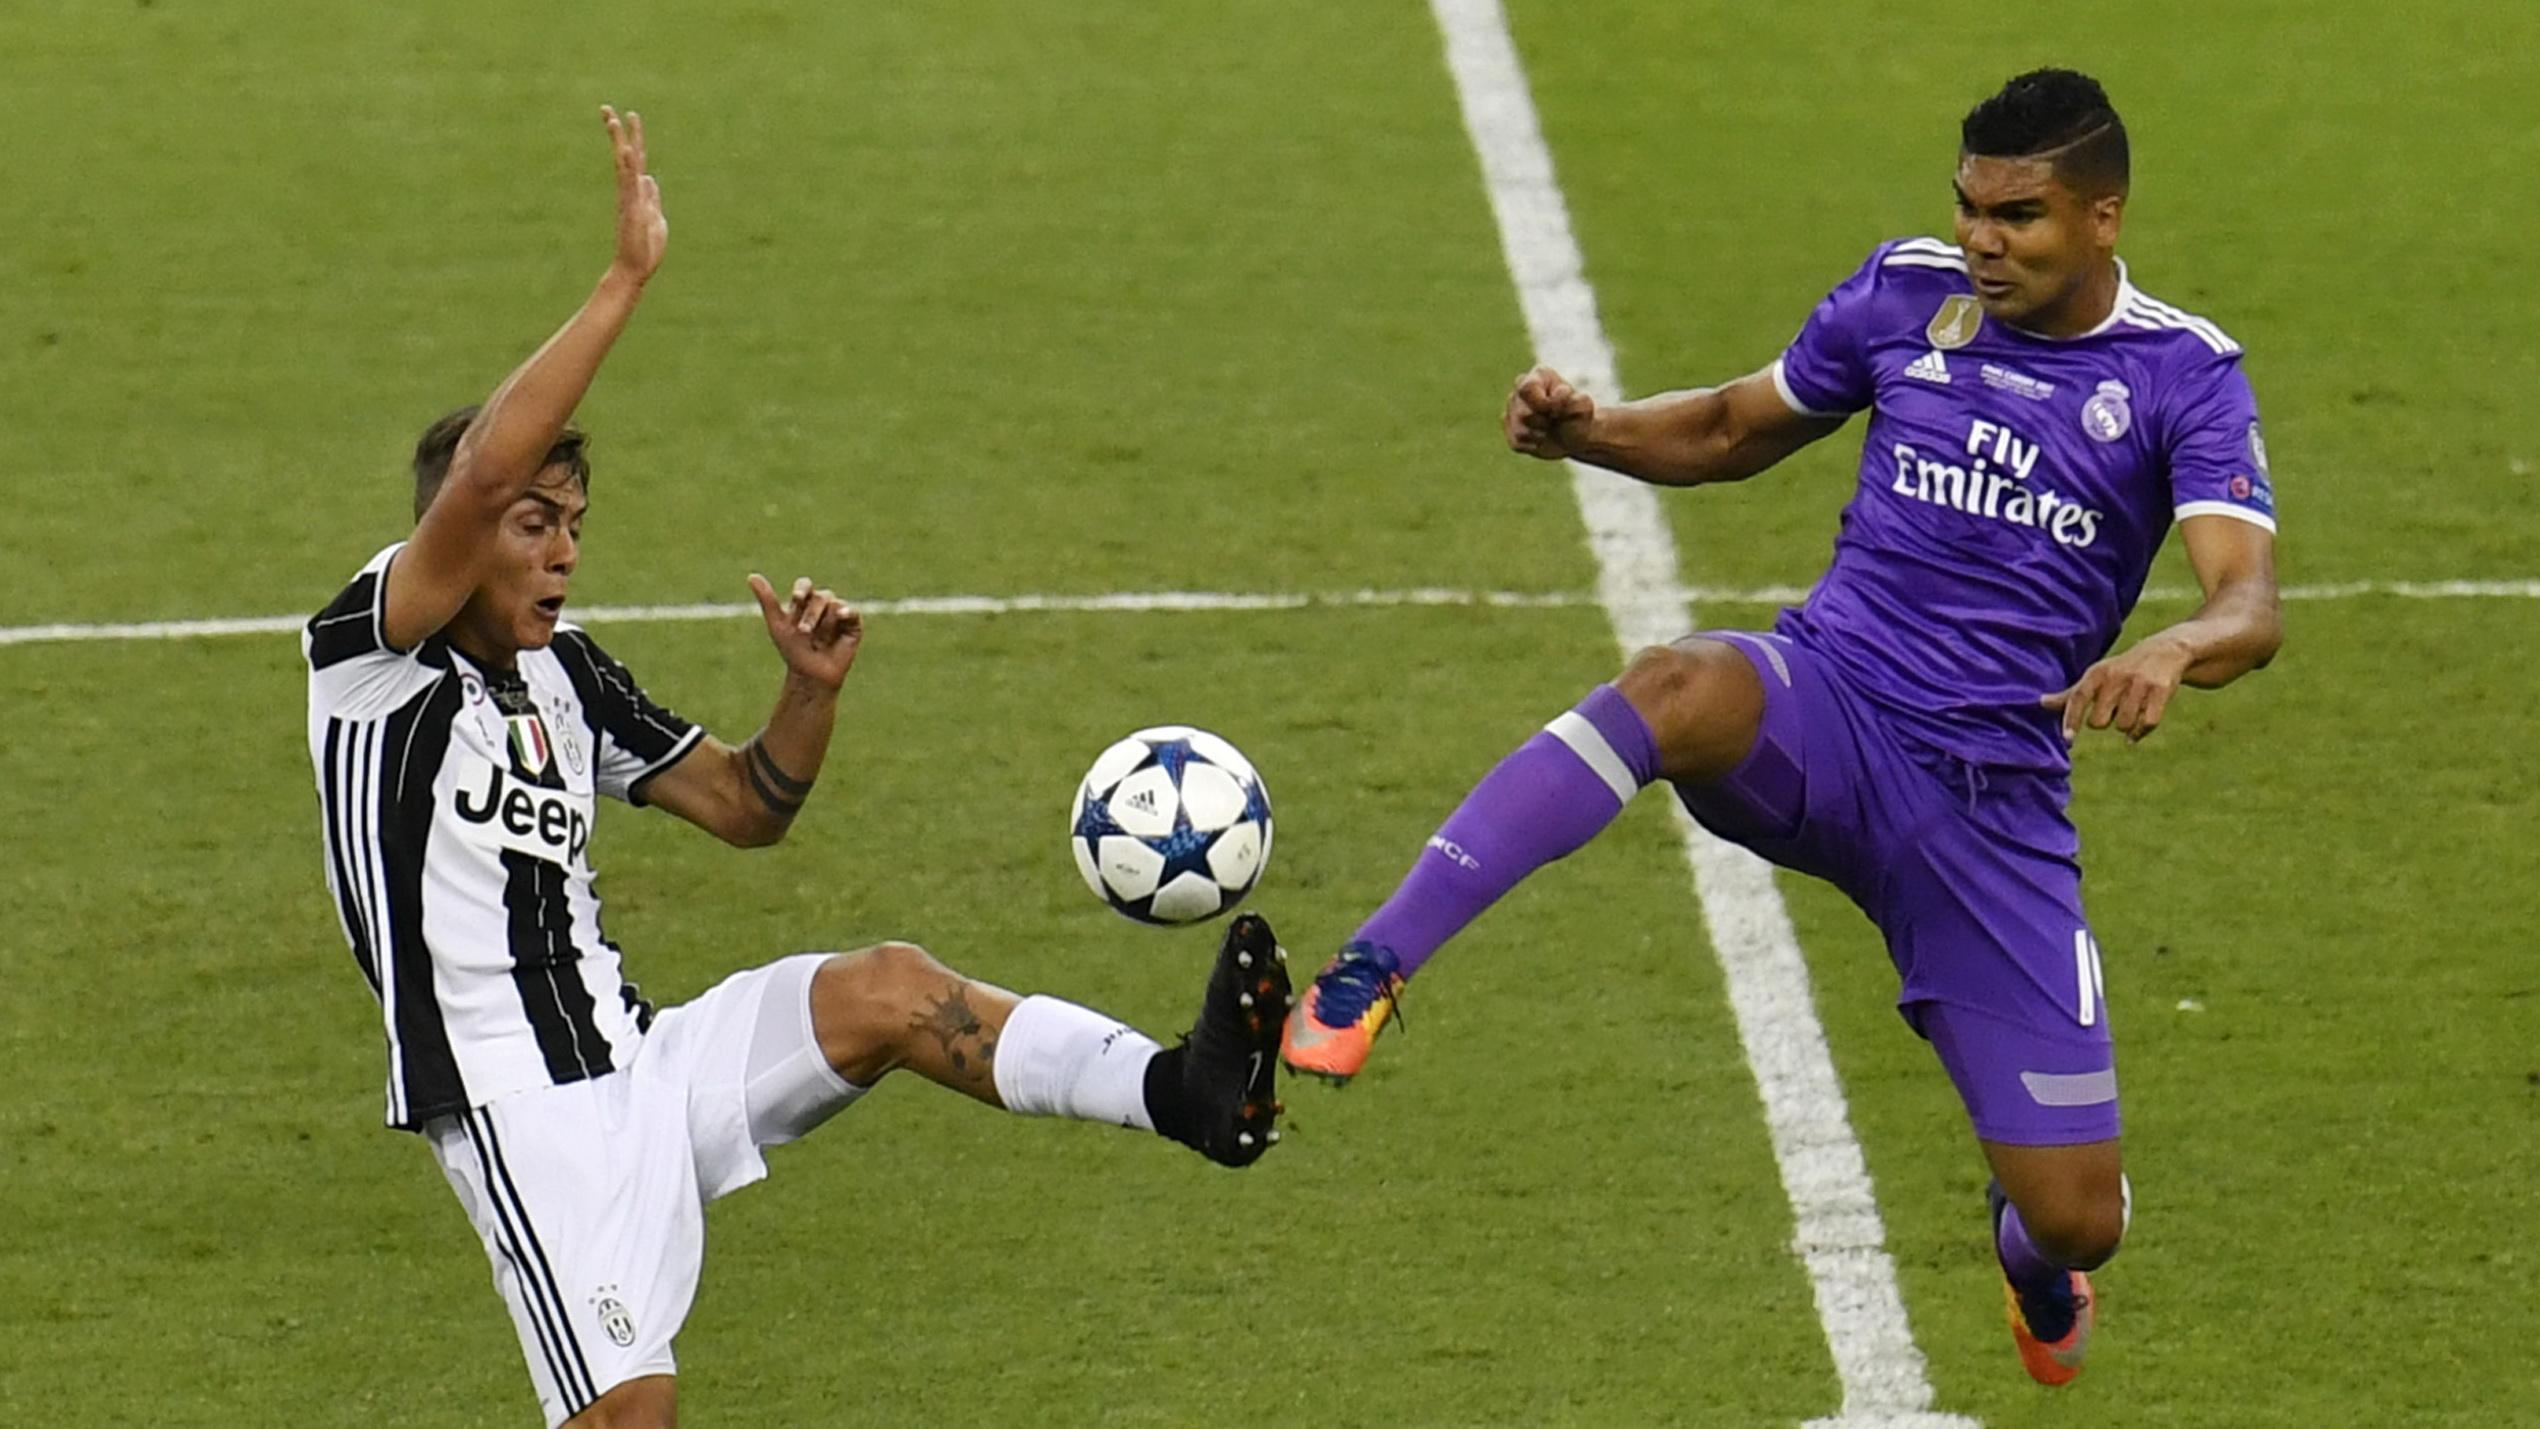 Andrea Barzagli Juventus Karim Benzema Real Madrid Champions League